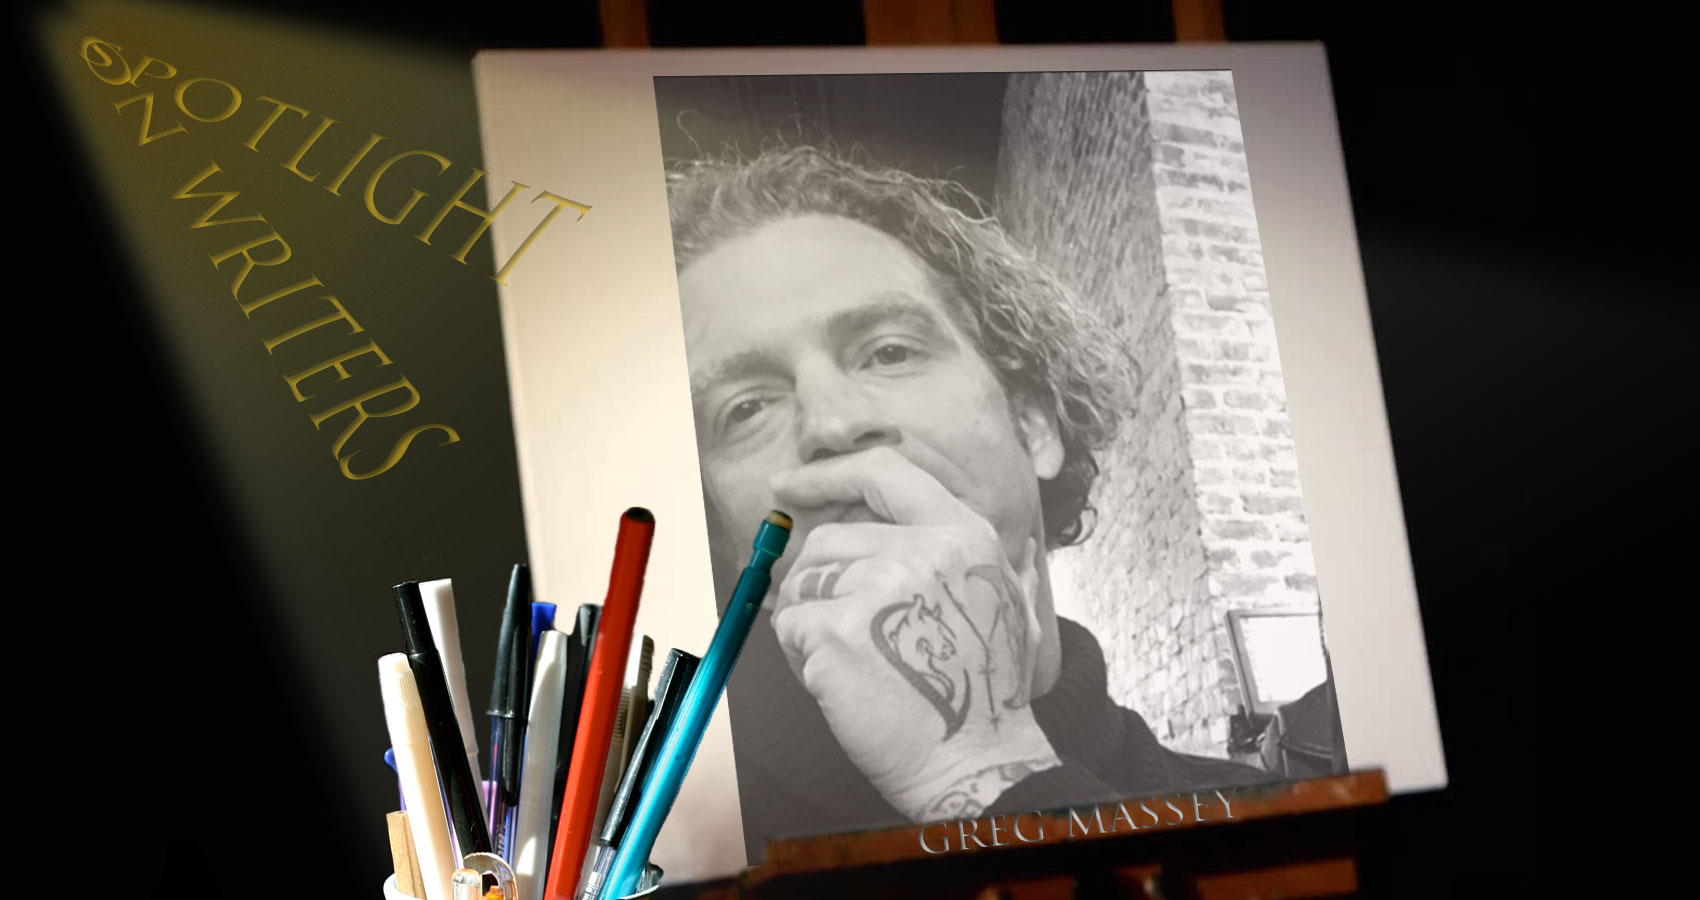 Spotlight On Writers - Greg Massey, interview at Spillwords